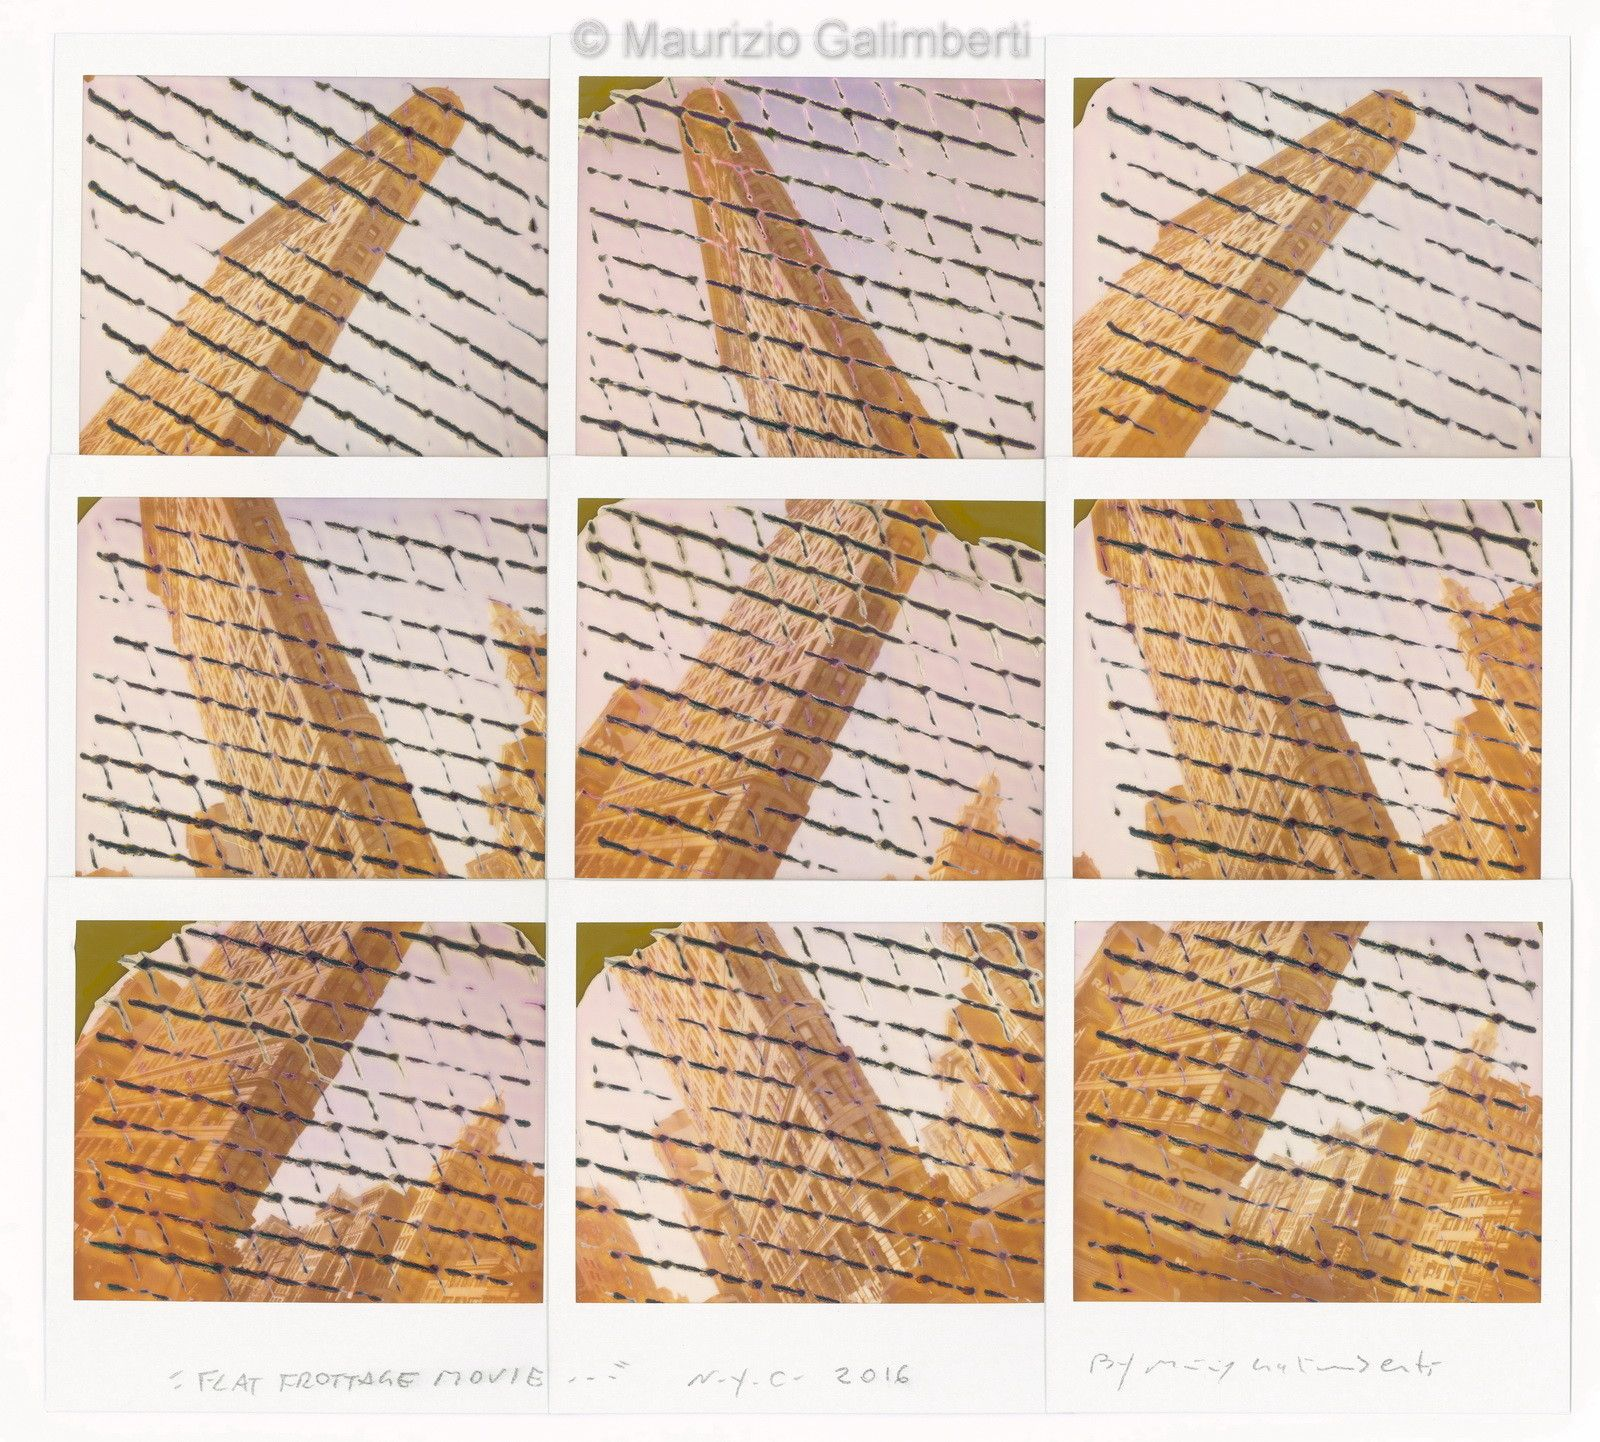 "VINTAGE POLAROD MAURIZIO GALIMBERTI ""FLAT FROTTAGE MOVIE"" dimensioni cm 53x50"